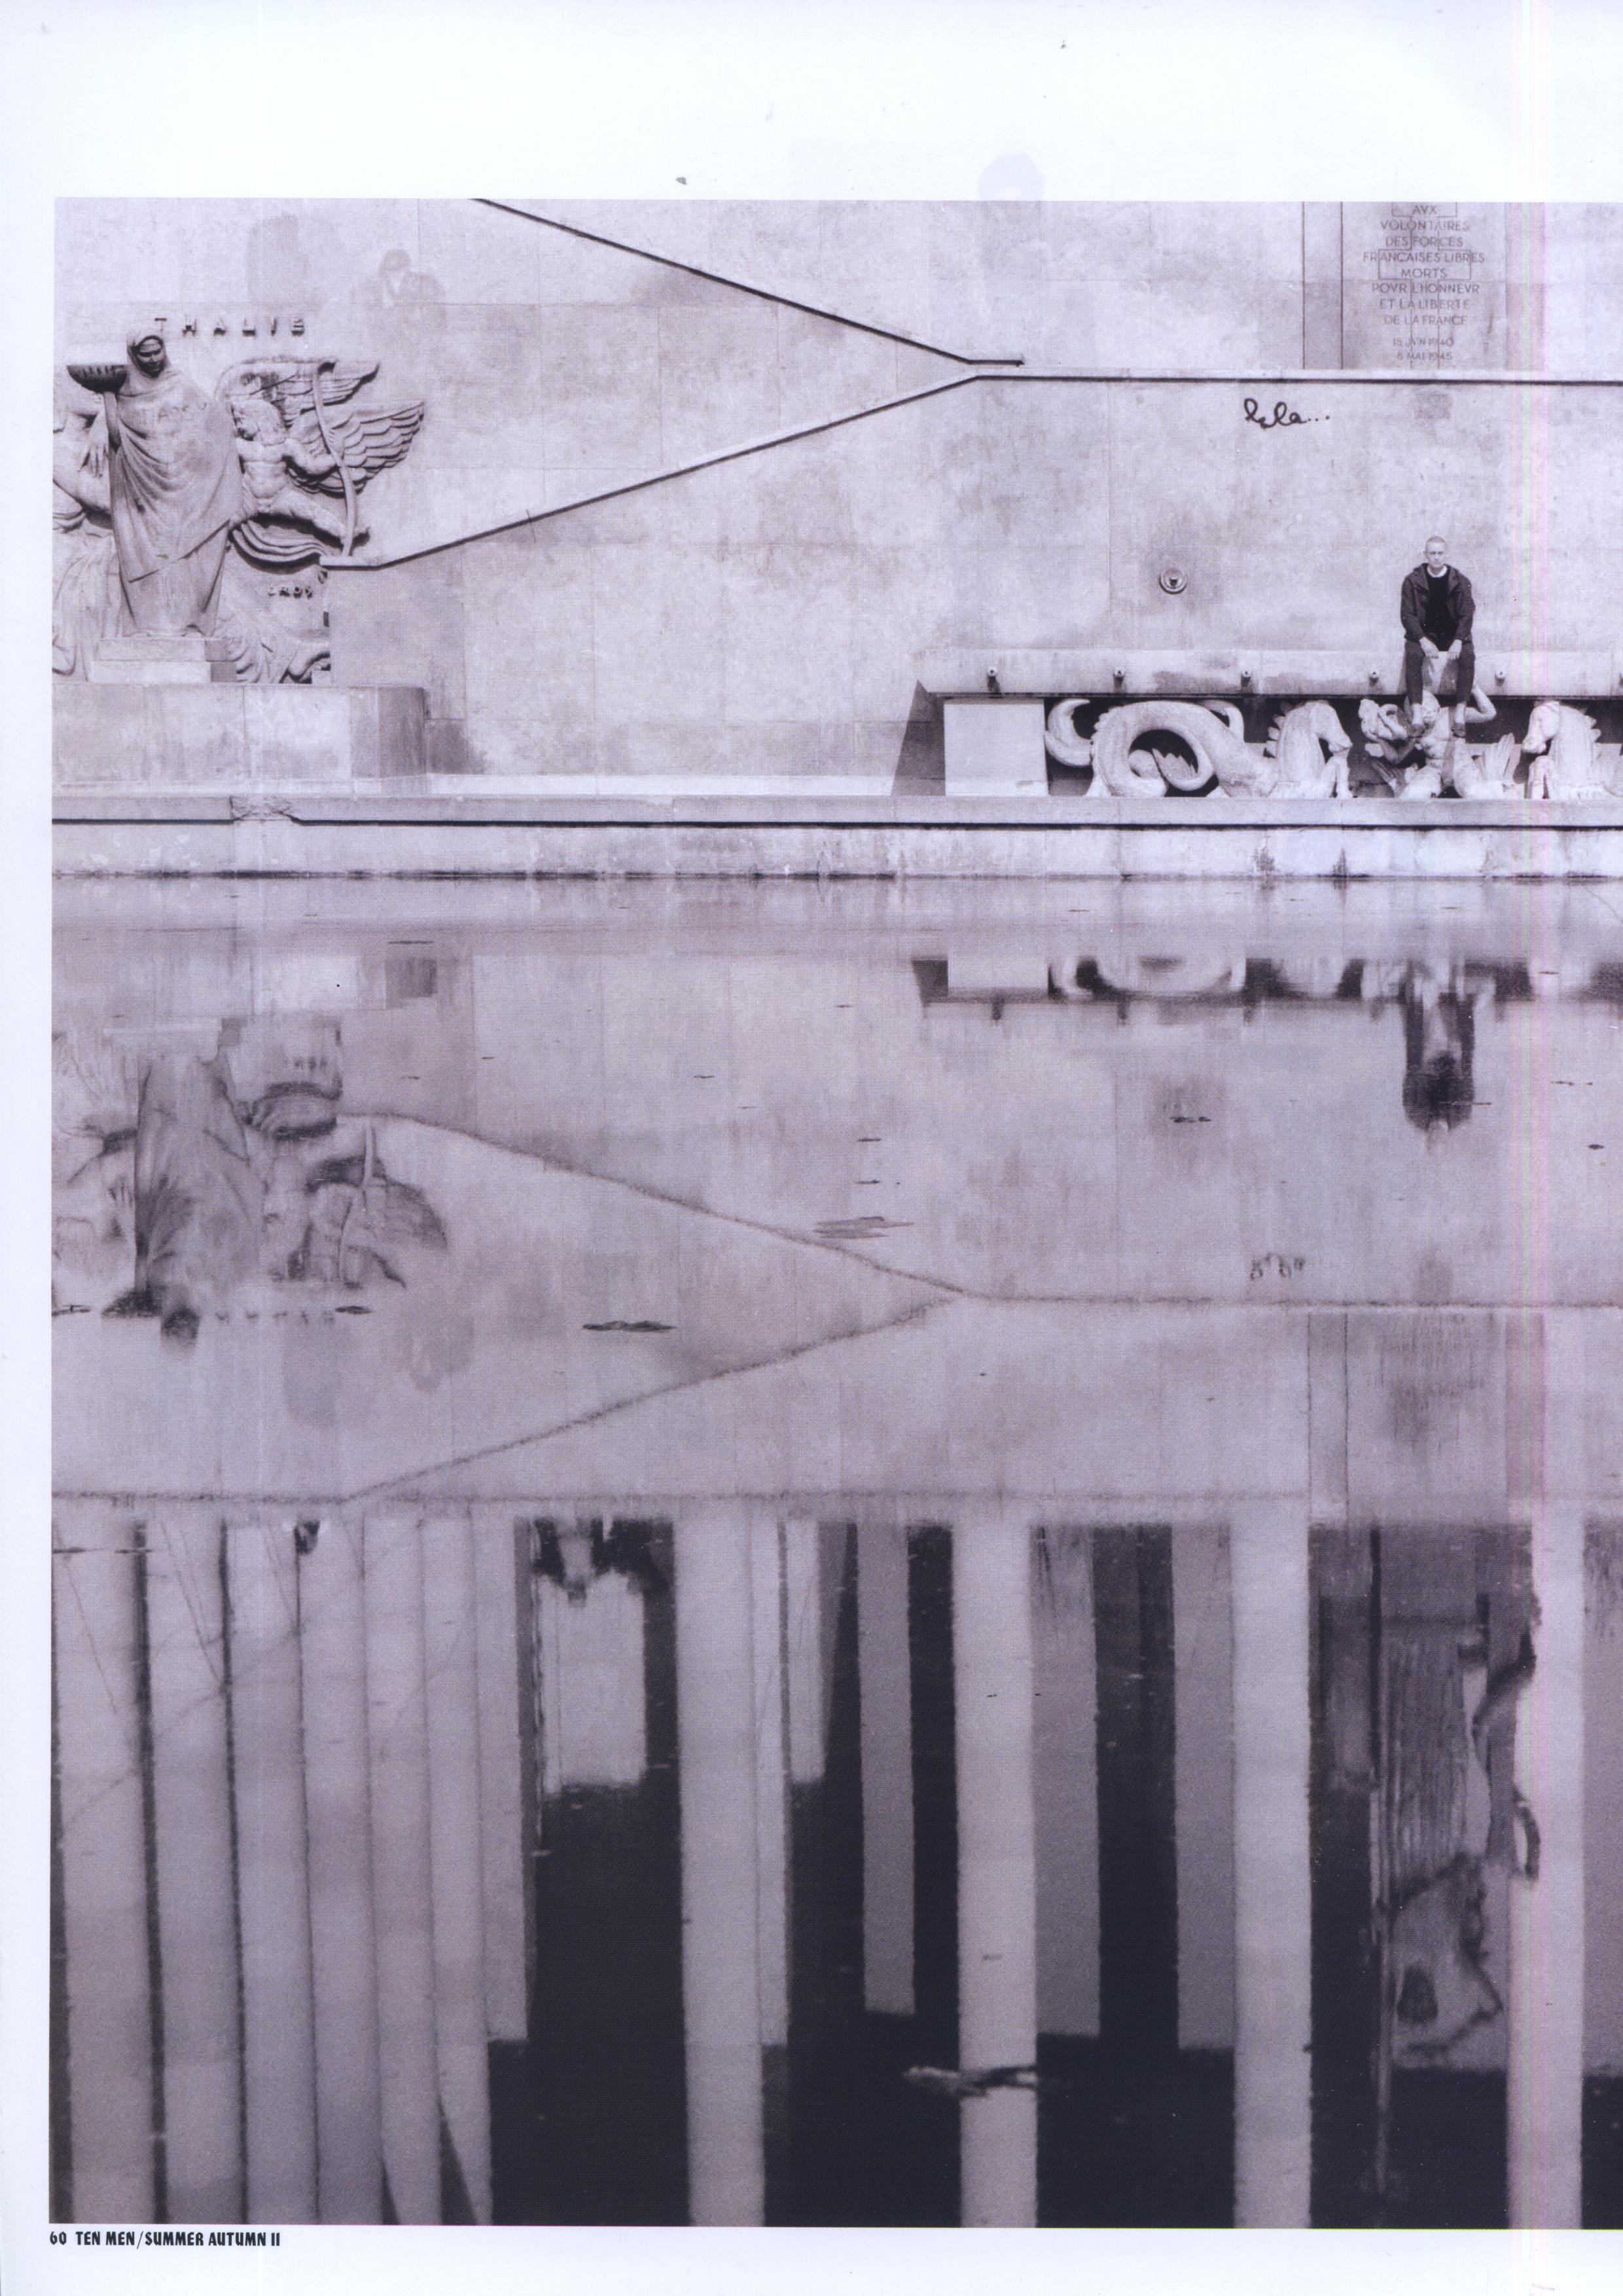 Kira Bunse - pg 1 - Issue 26 SA11.jpeg